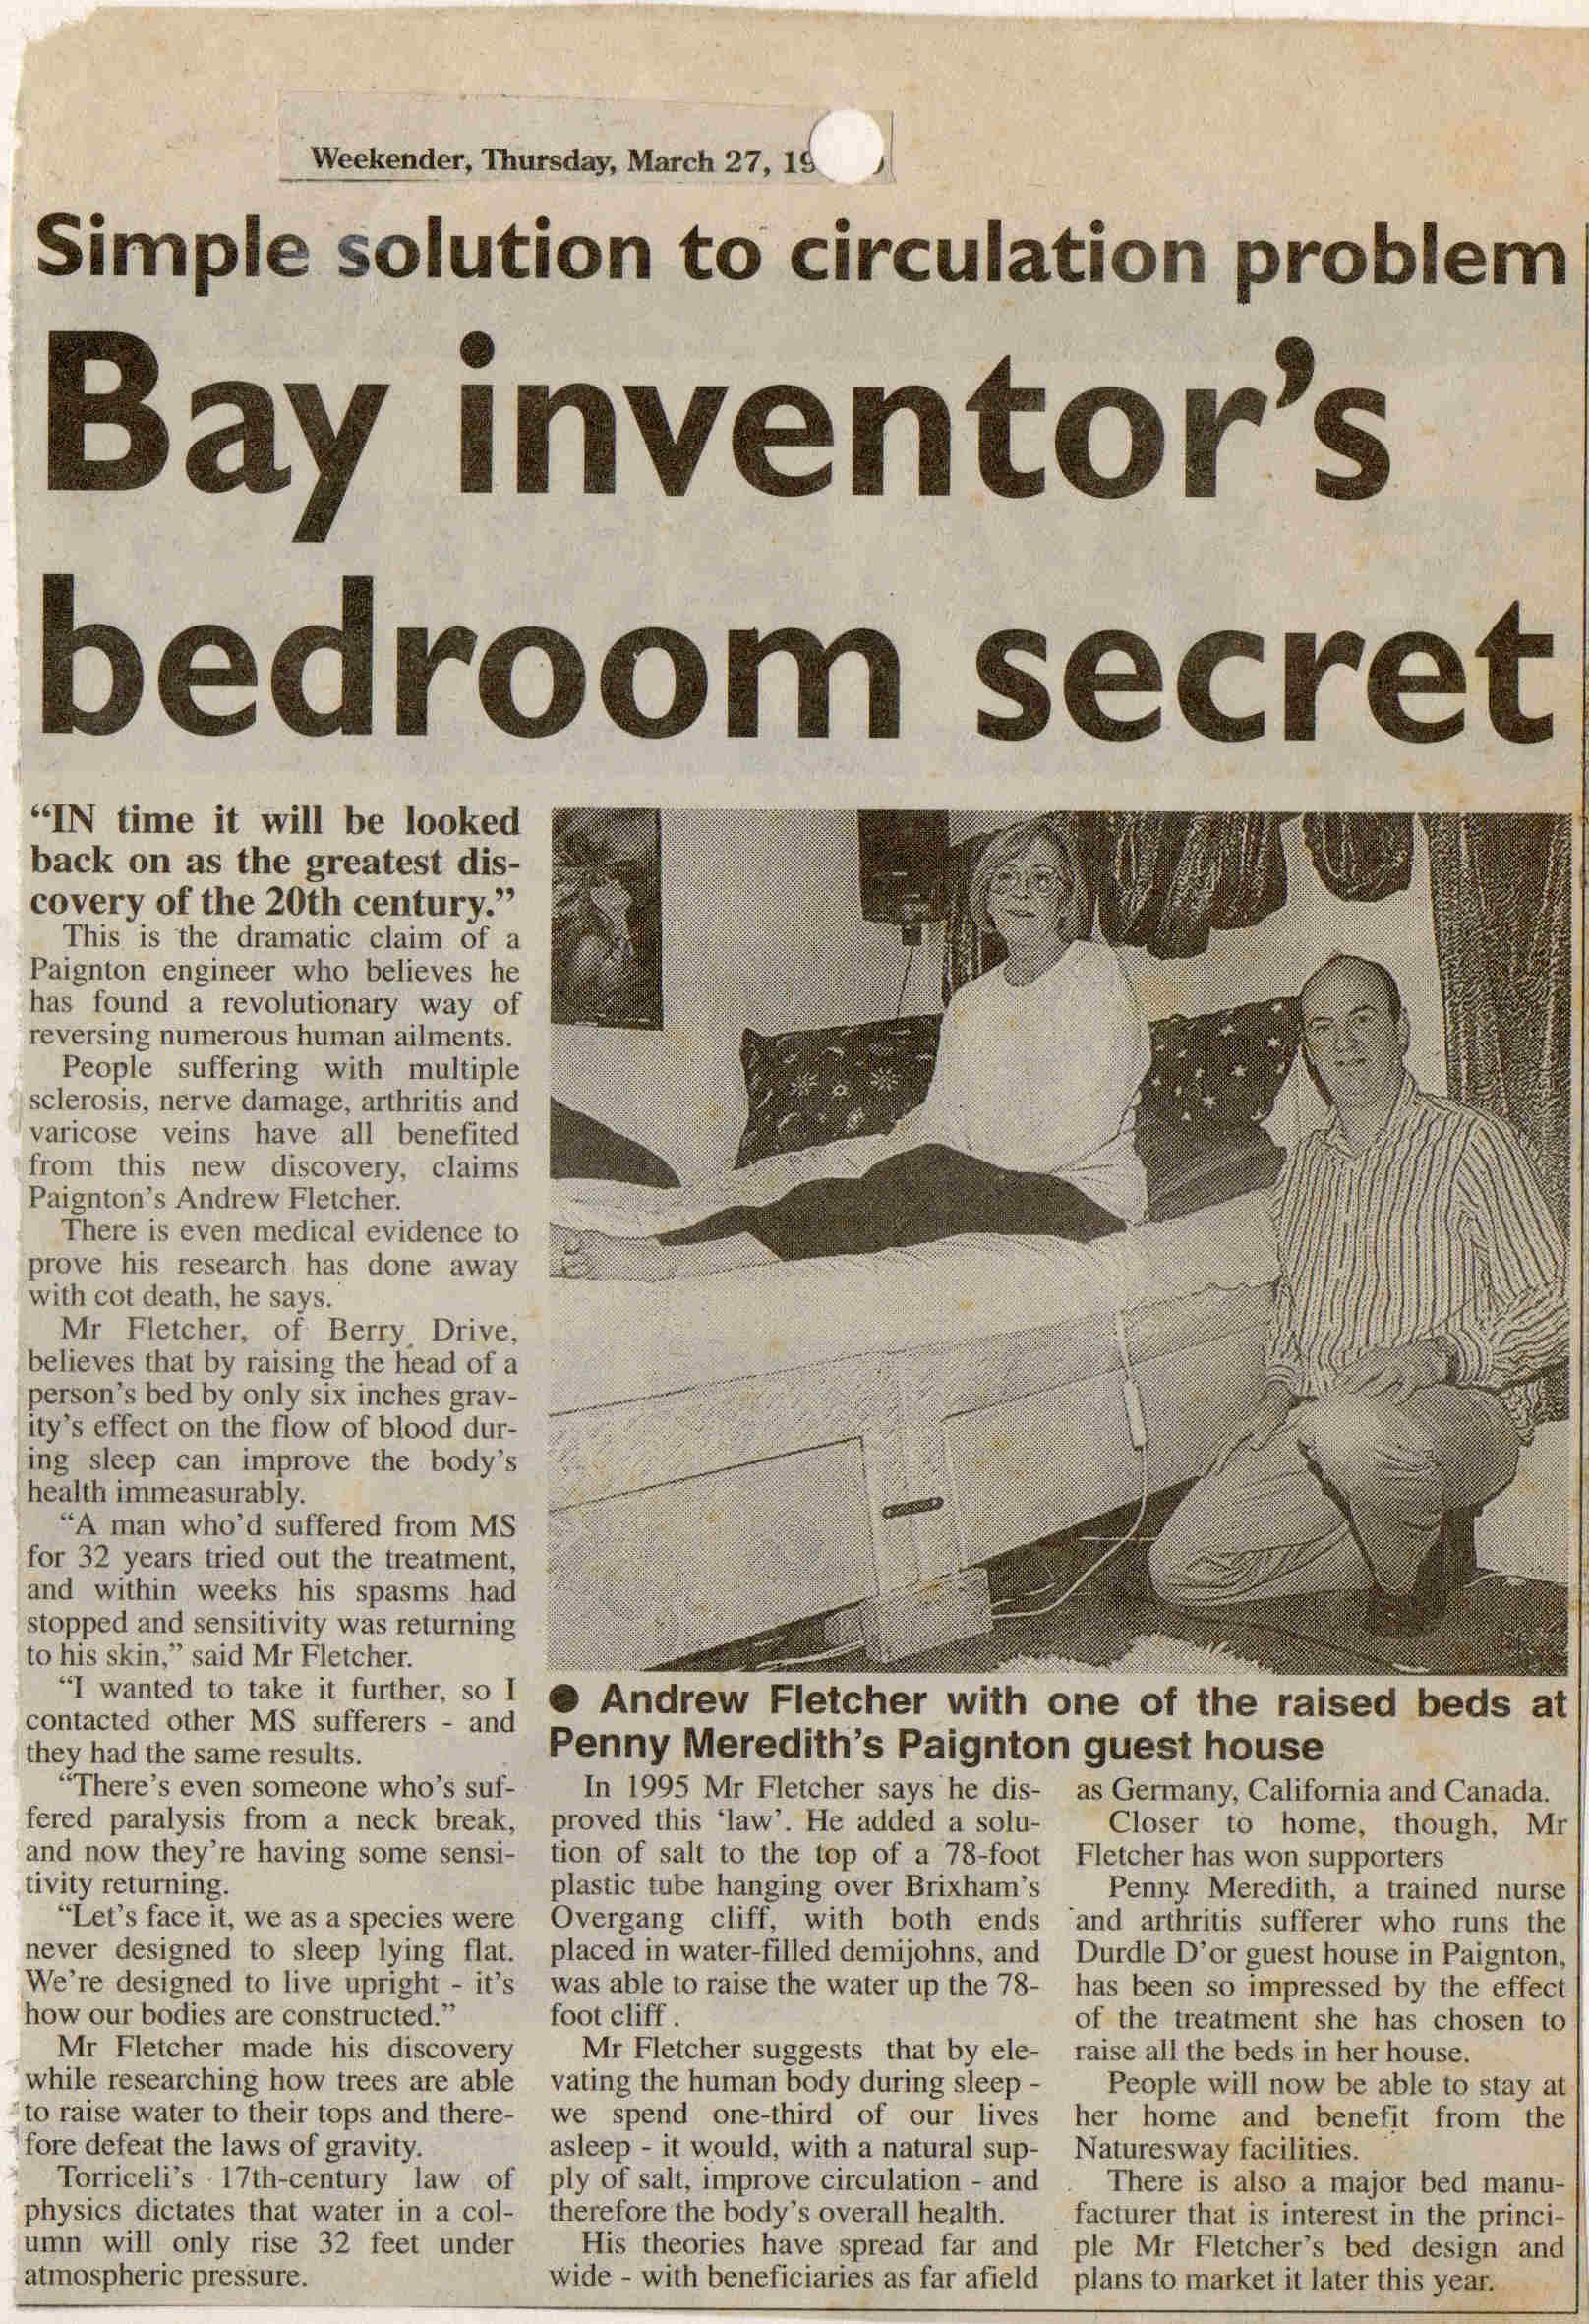 Bay inventor s bedroom secret. Bay inventor s bedroom secret   Inclined Bed Therapy  IBT